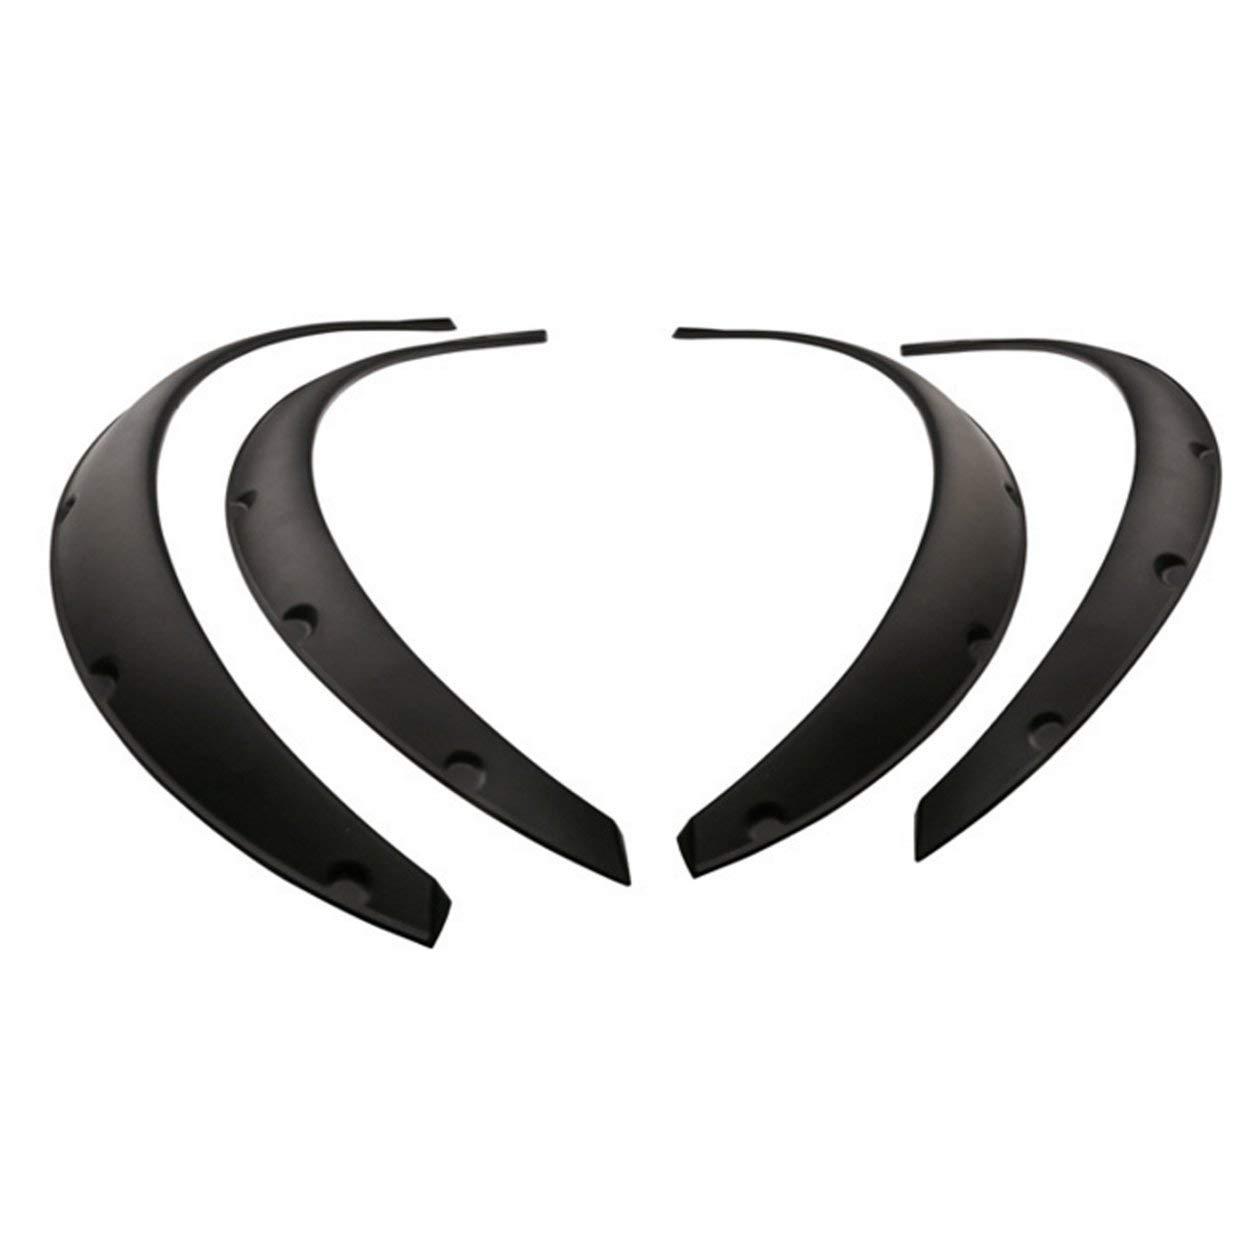 4Pcs Universal Flexible Car Fender Flares Extra Wide Body Wheel Arches Wheel Eyebrow Protector Lip Sticker Trim CNluca